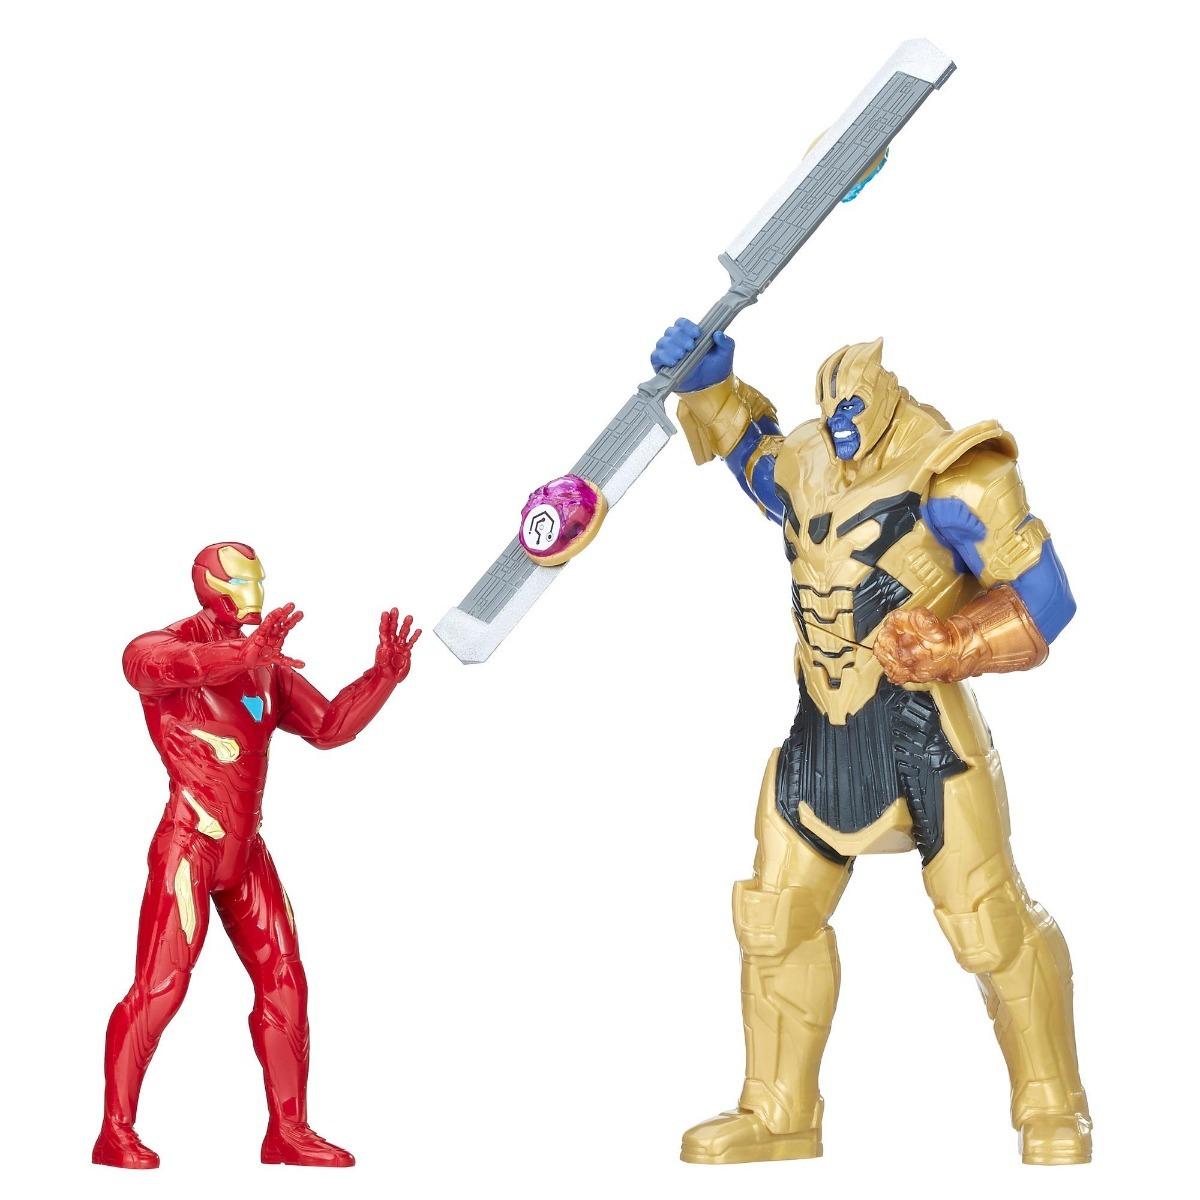 AvengersInfinity Thanos Juguete Iron War Batalla Man Vs 9eWDHE2IYb